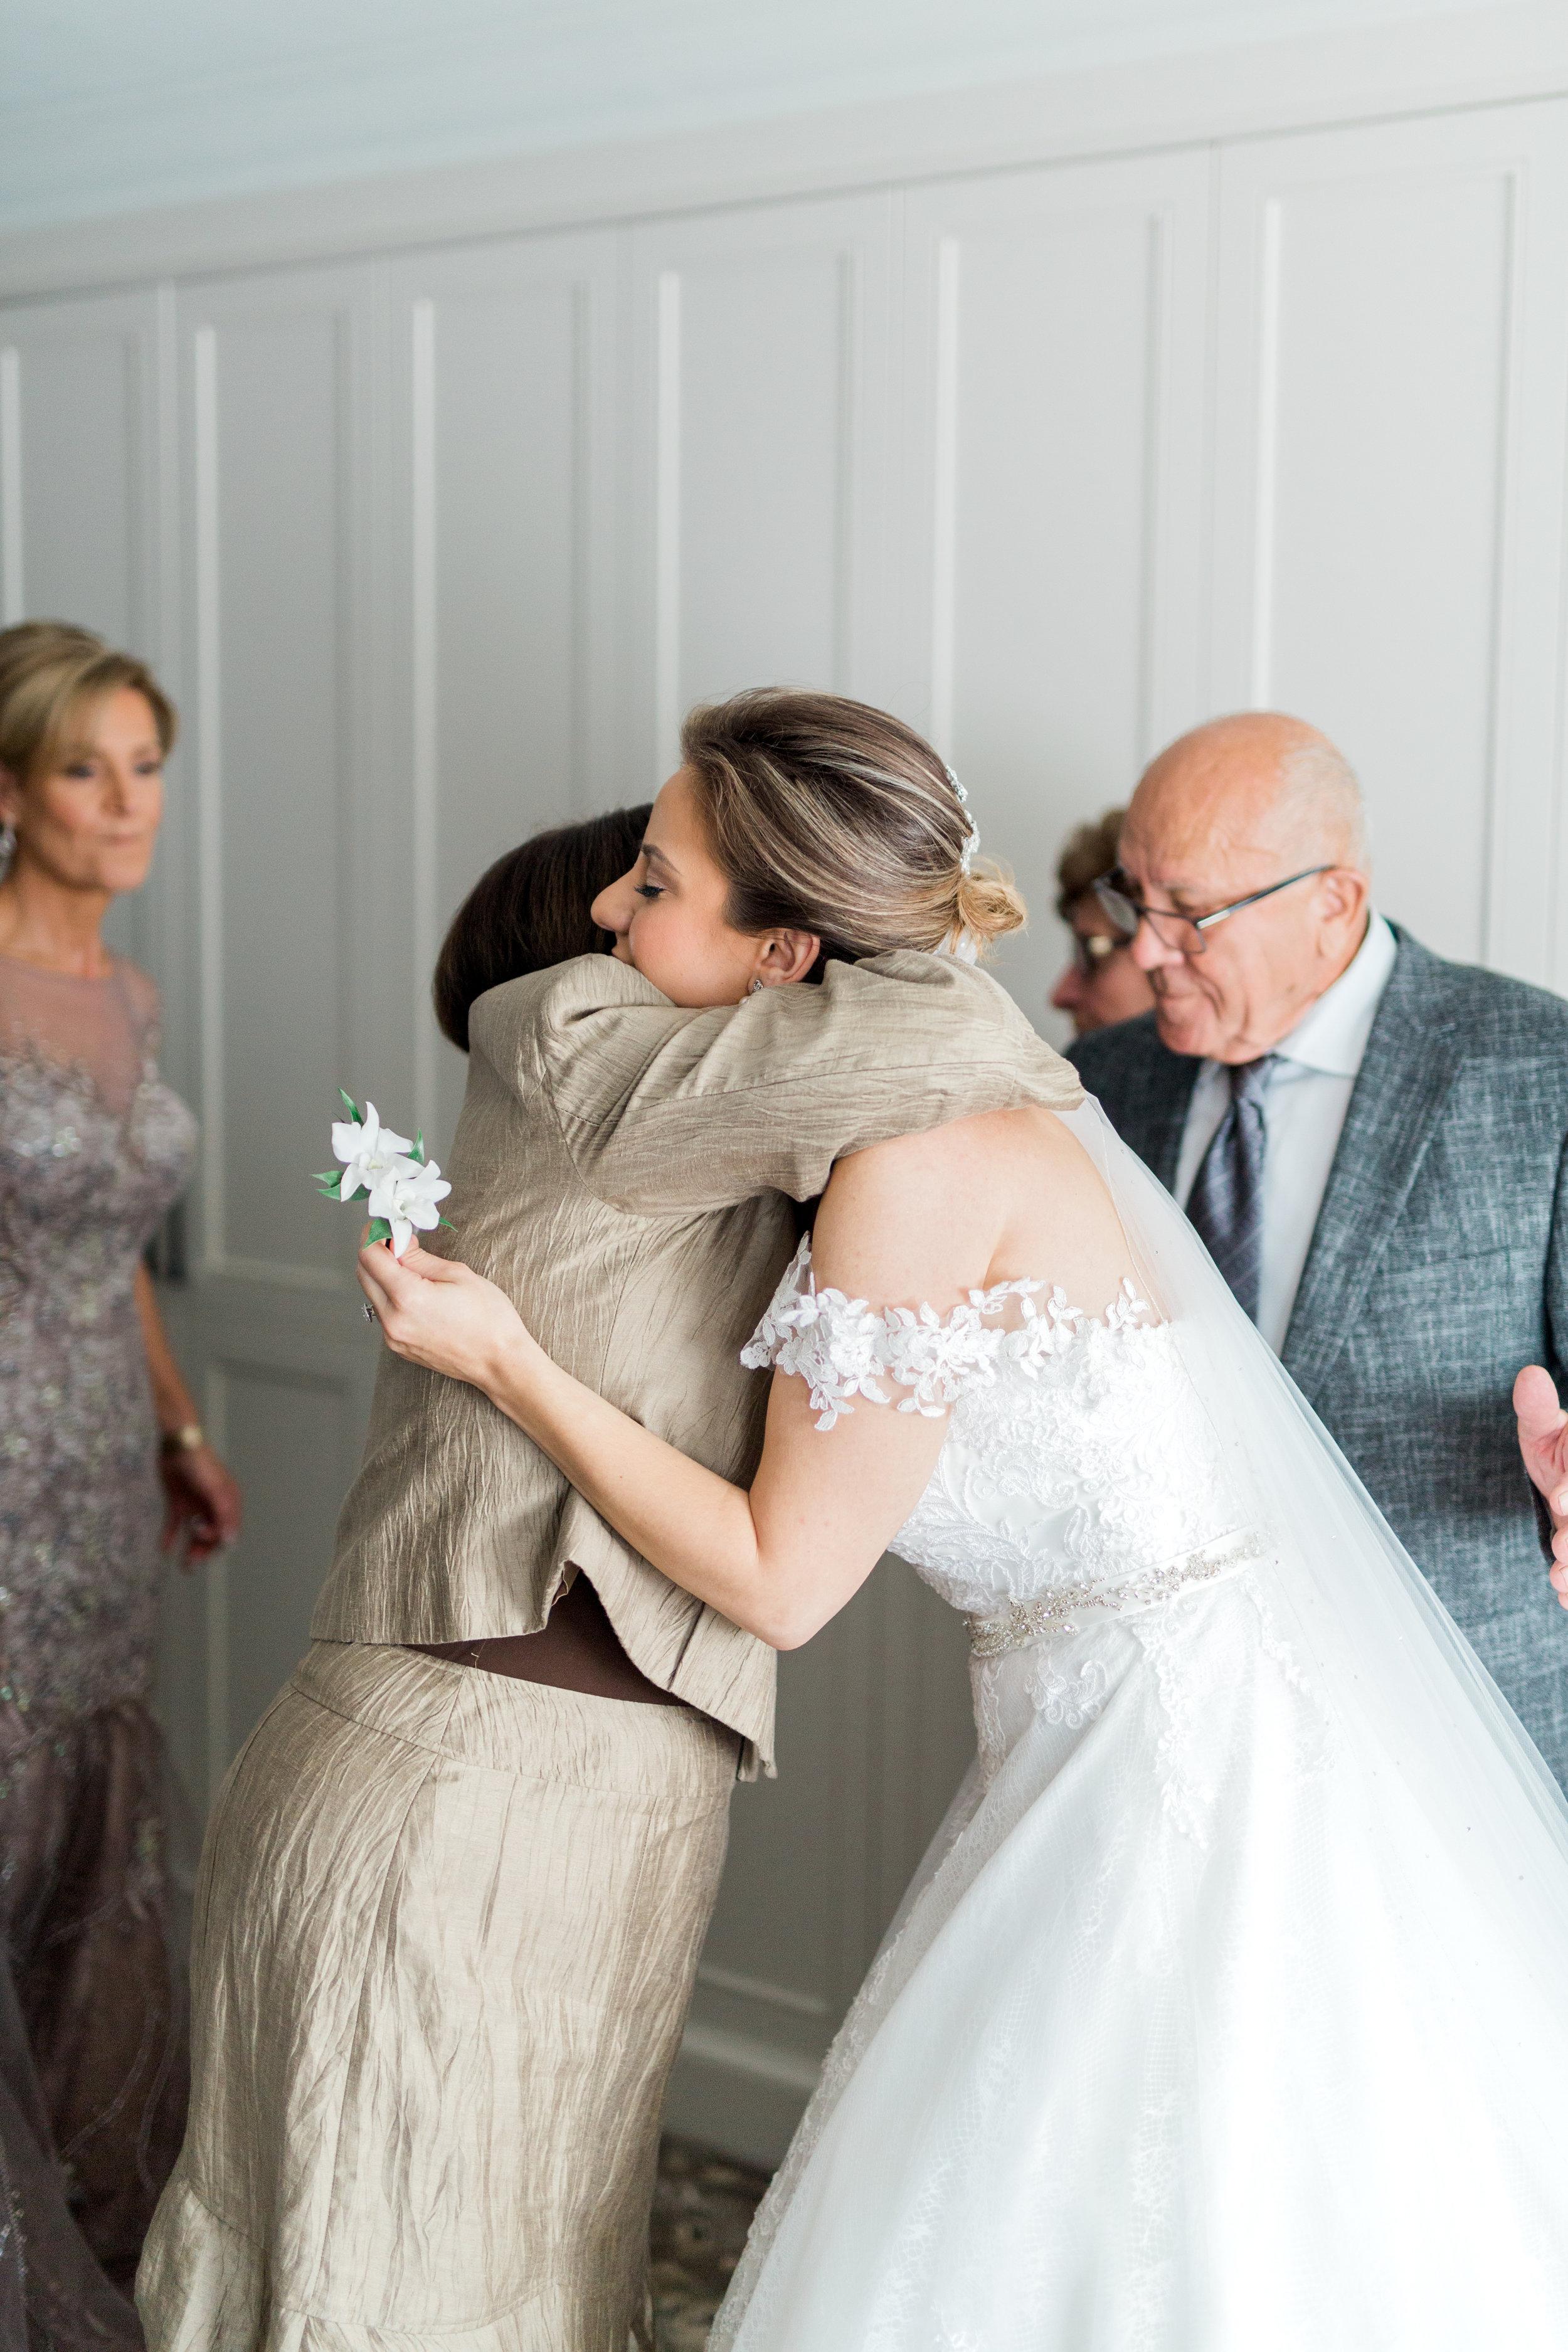 Danielle-Giroux-Amir-Golbazi-Toronto-Wedding-Photographer-Bellvue-Manor_DeLuca_1-214.jpg